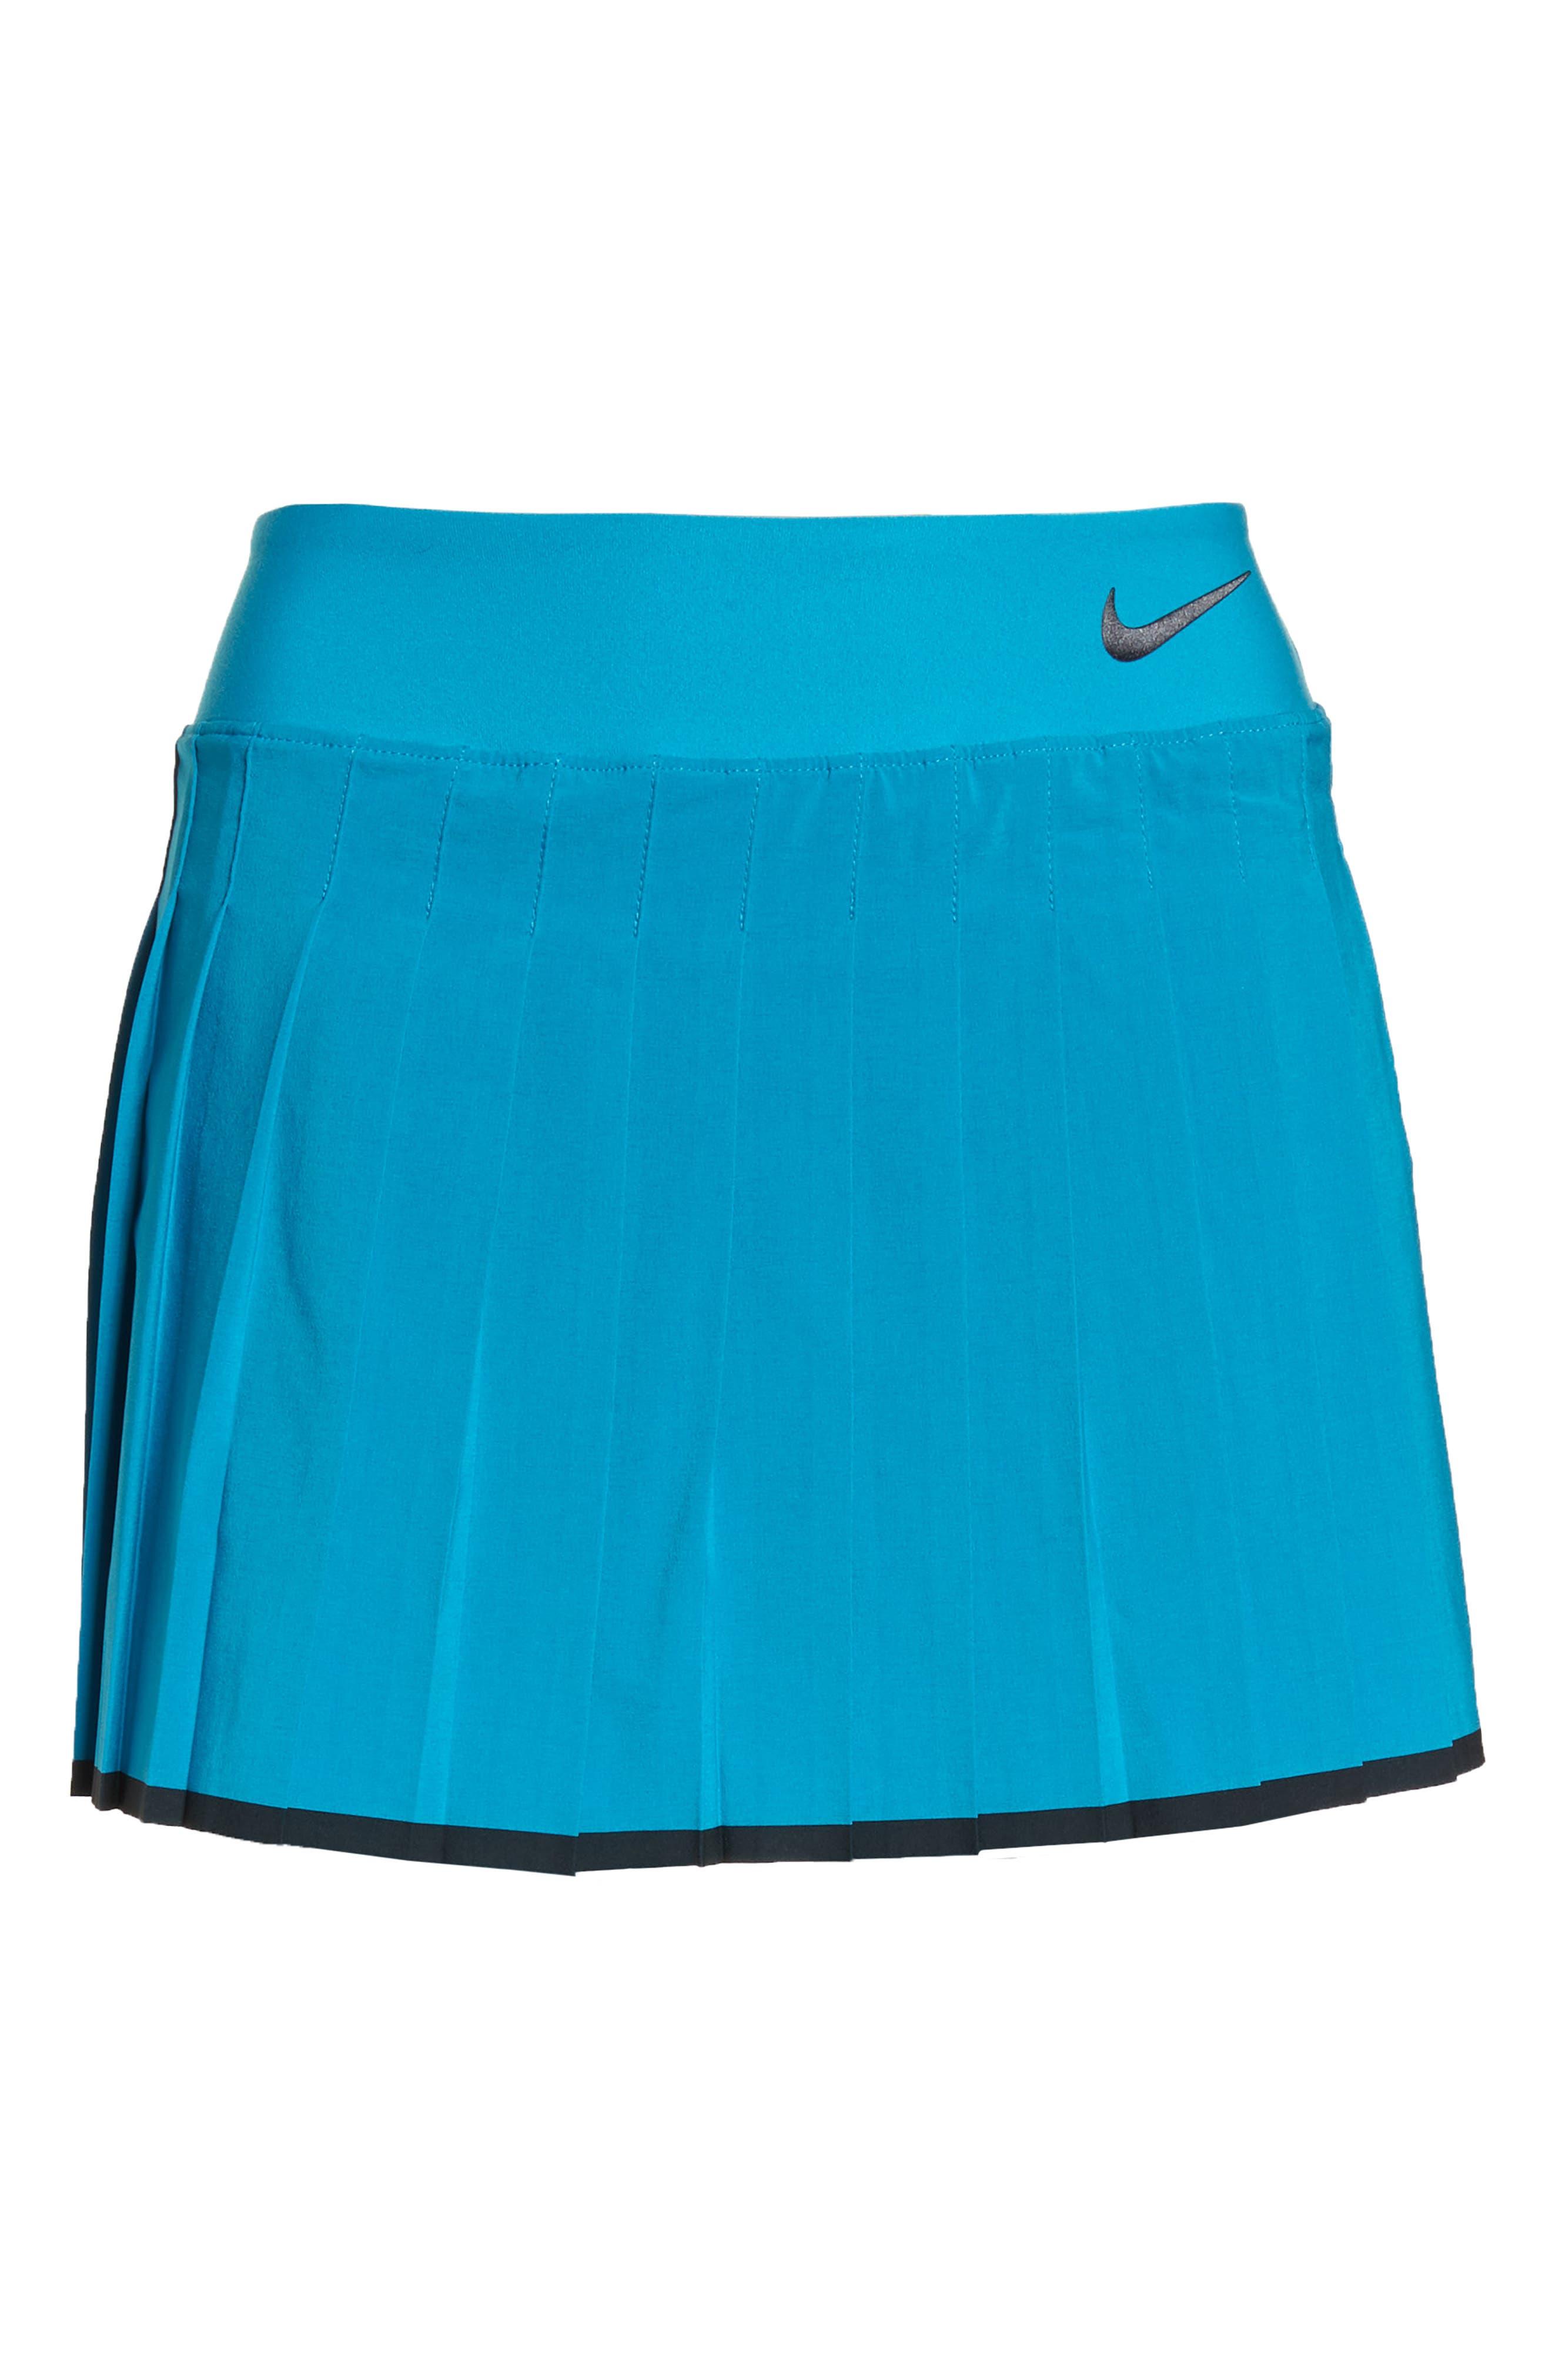 'Victory' Pleat Dri-FIT Tennis Skirt,                             Alternate thumbnail 7, color,                             Neo Turquoise/ Black